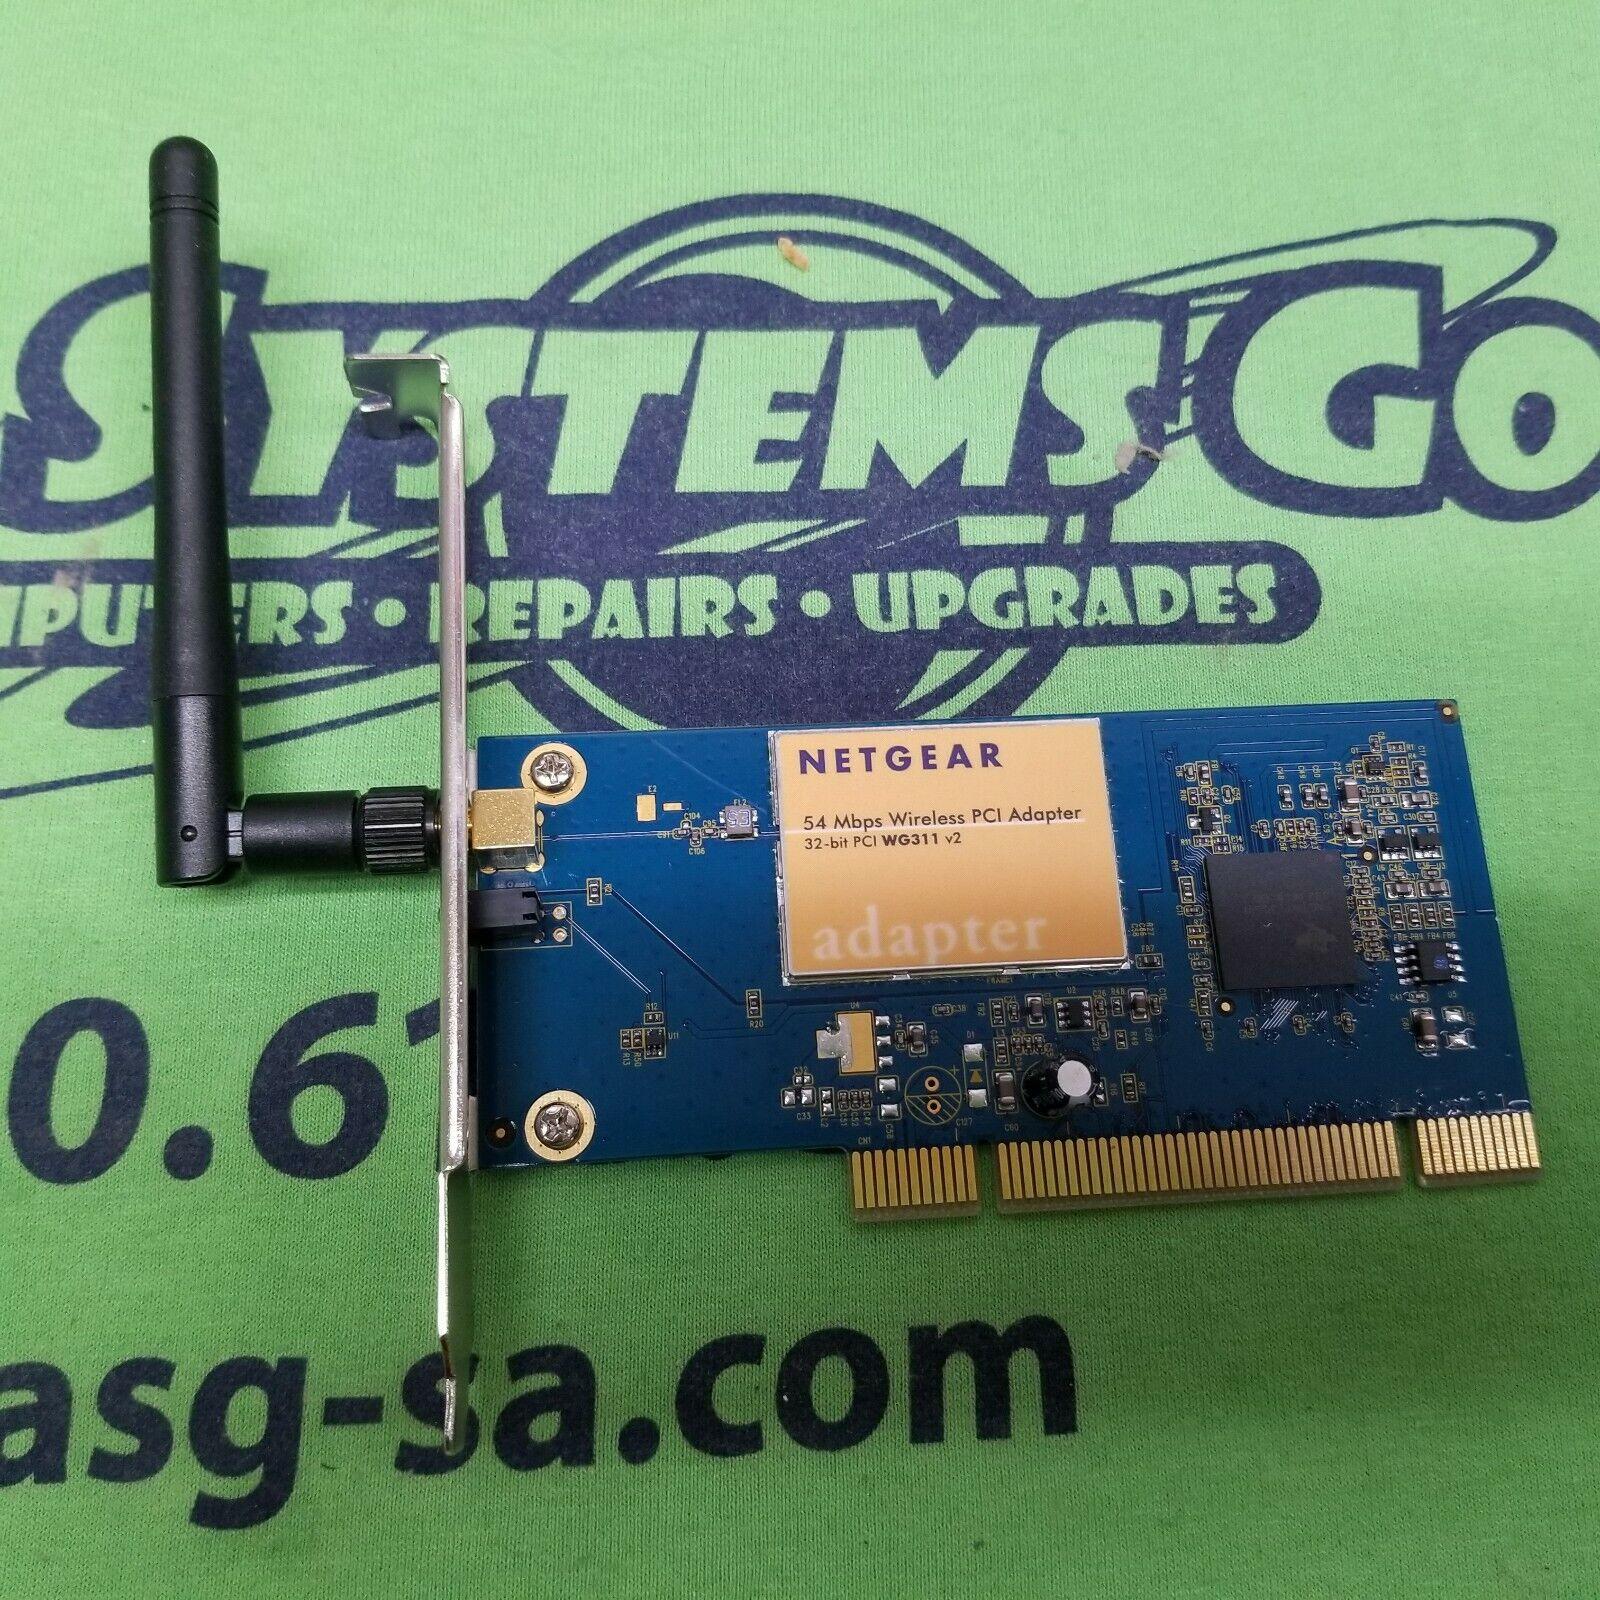 NETGEAR 54MBPS WIRELESS PCI ADAPTER 32-bit PCI WG311 v2